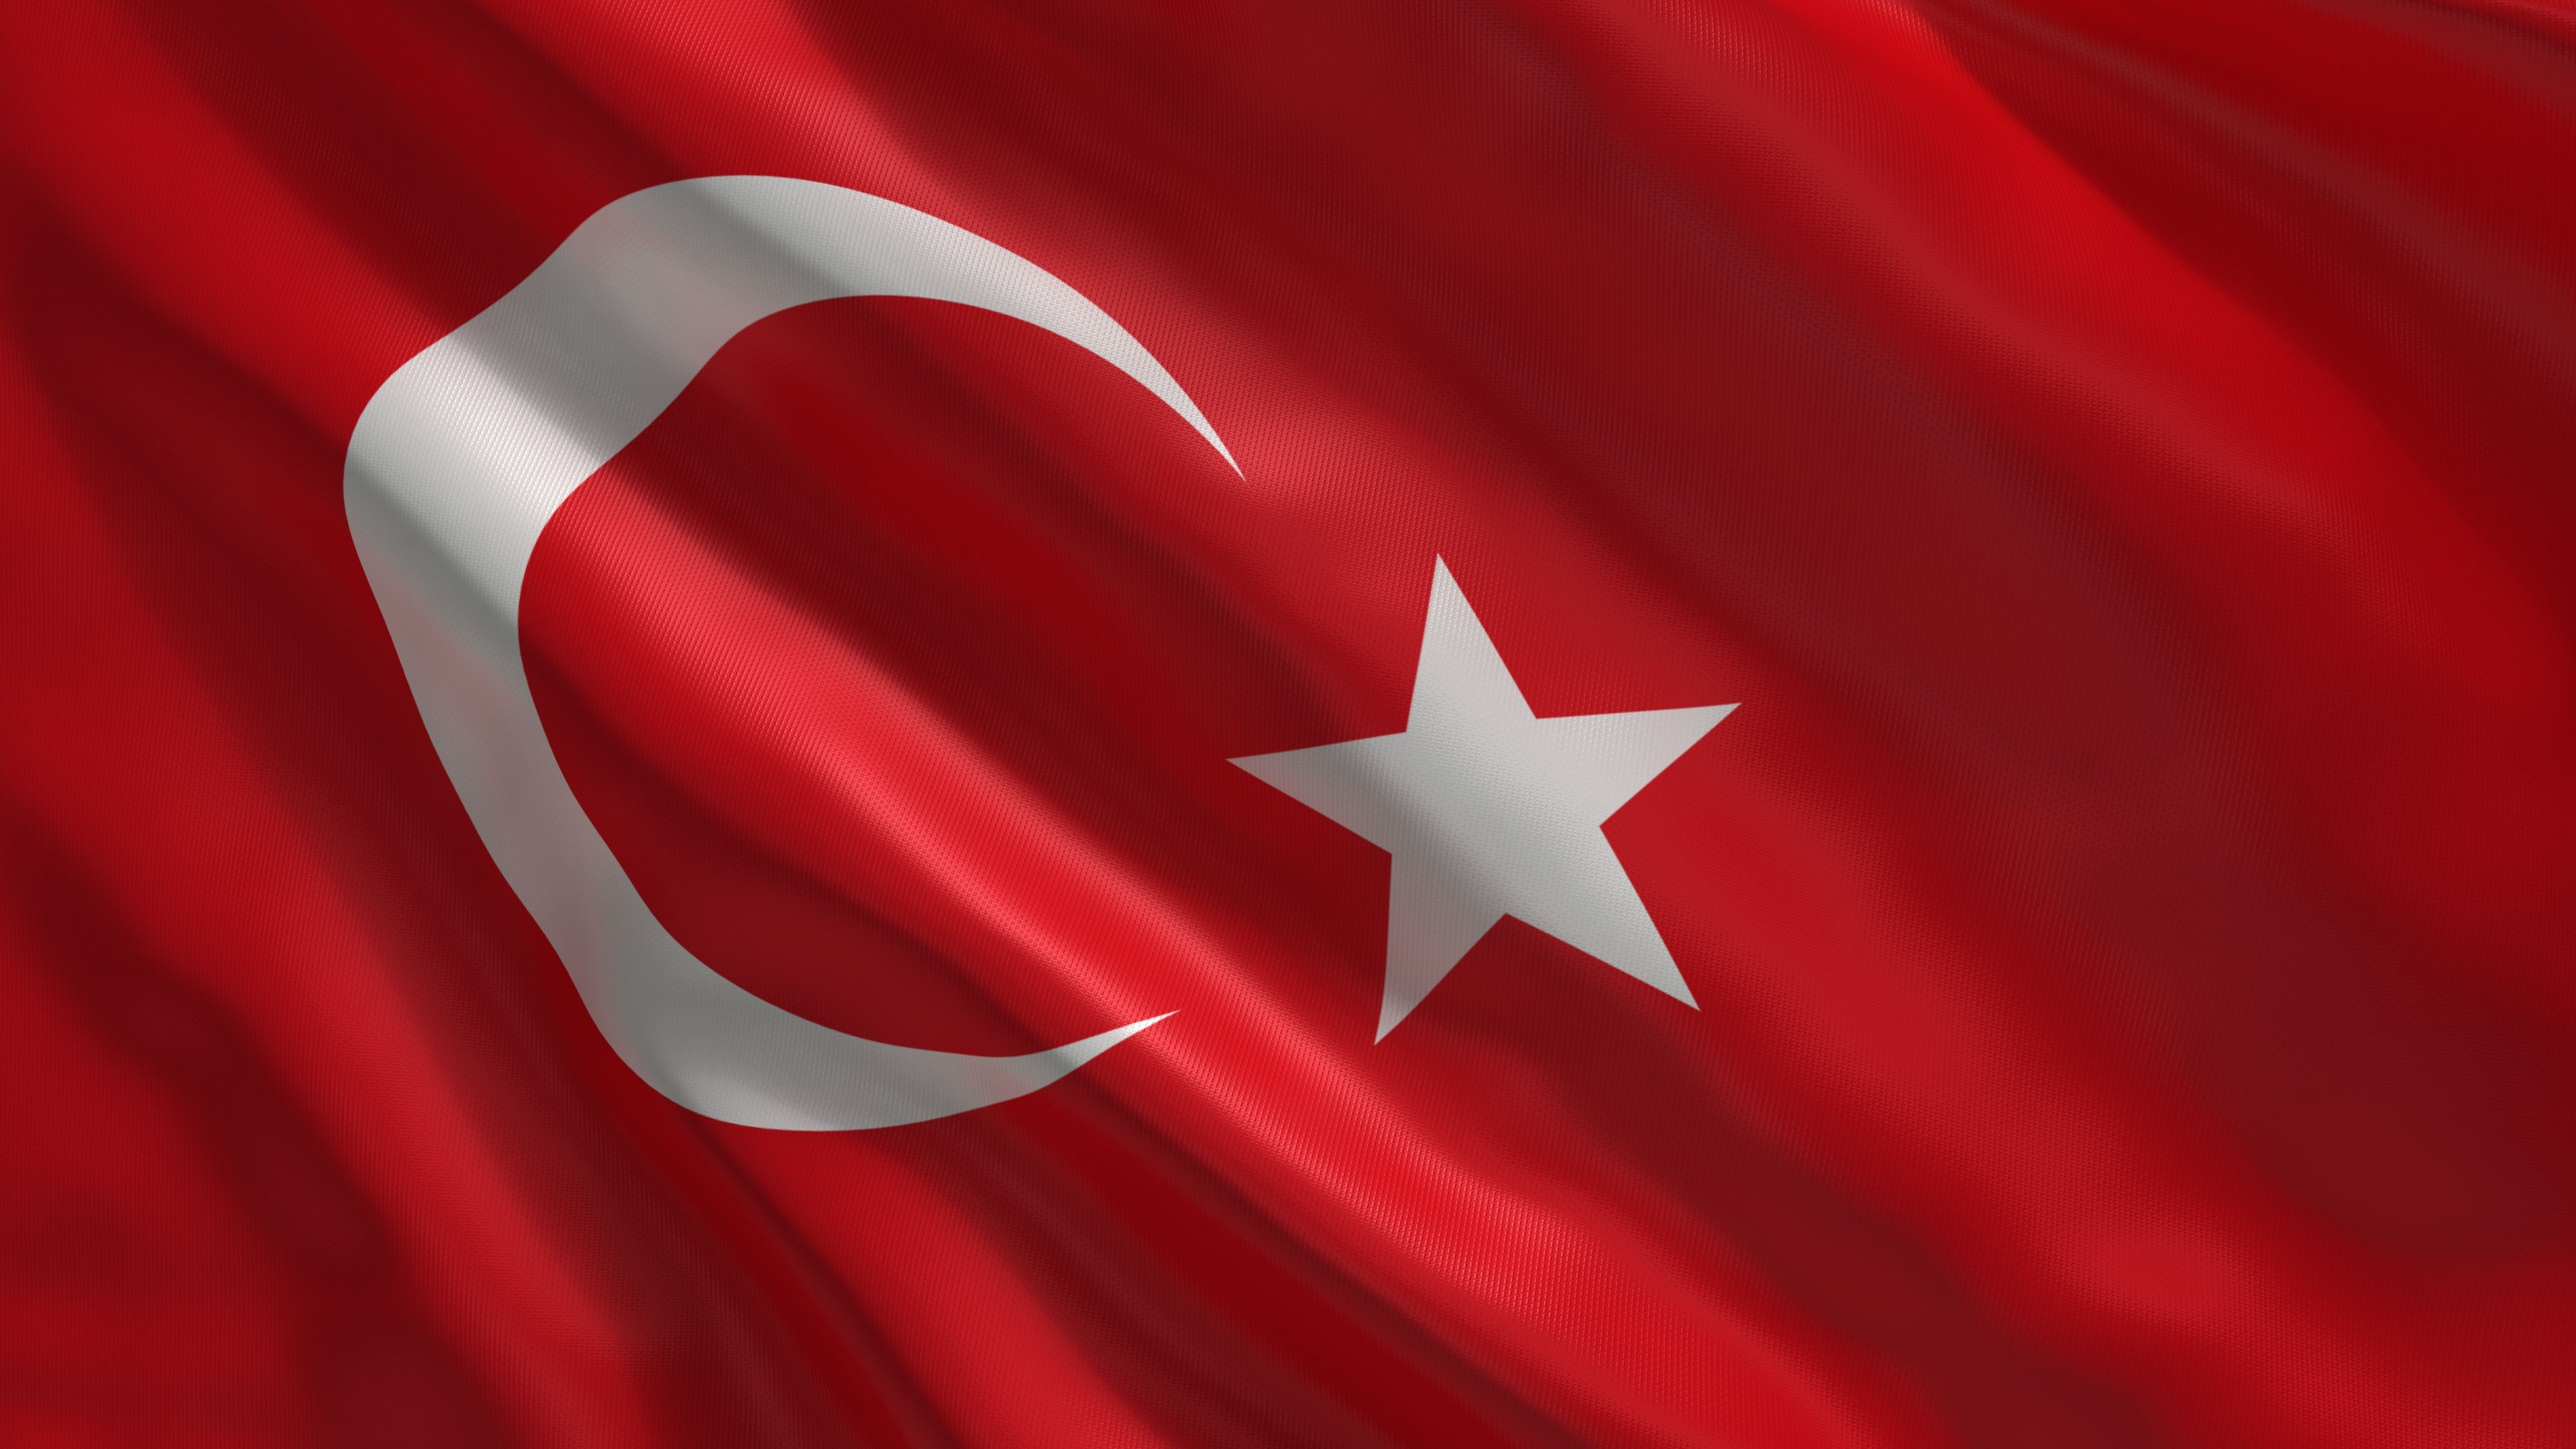 Bandera, turquia, flag, bandera turquia, Turkey flag ...